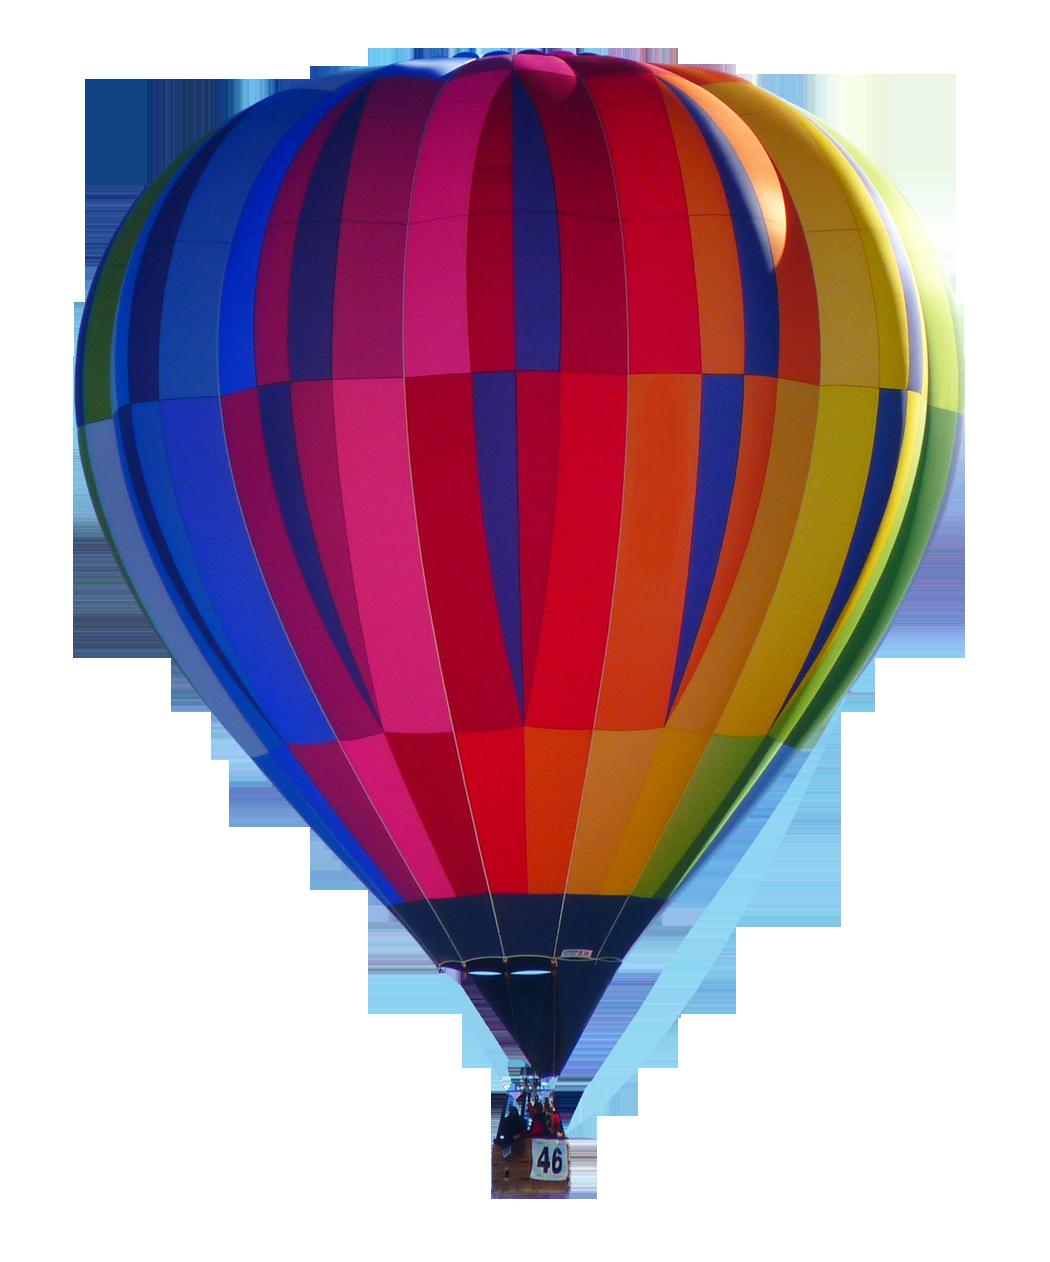 1050x1262 Hot Air Balloon Png Transparent Image